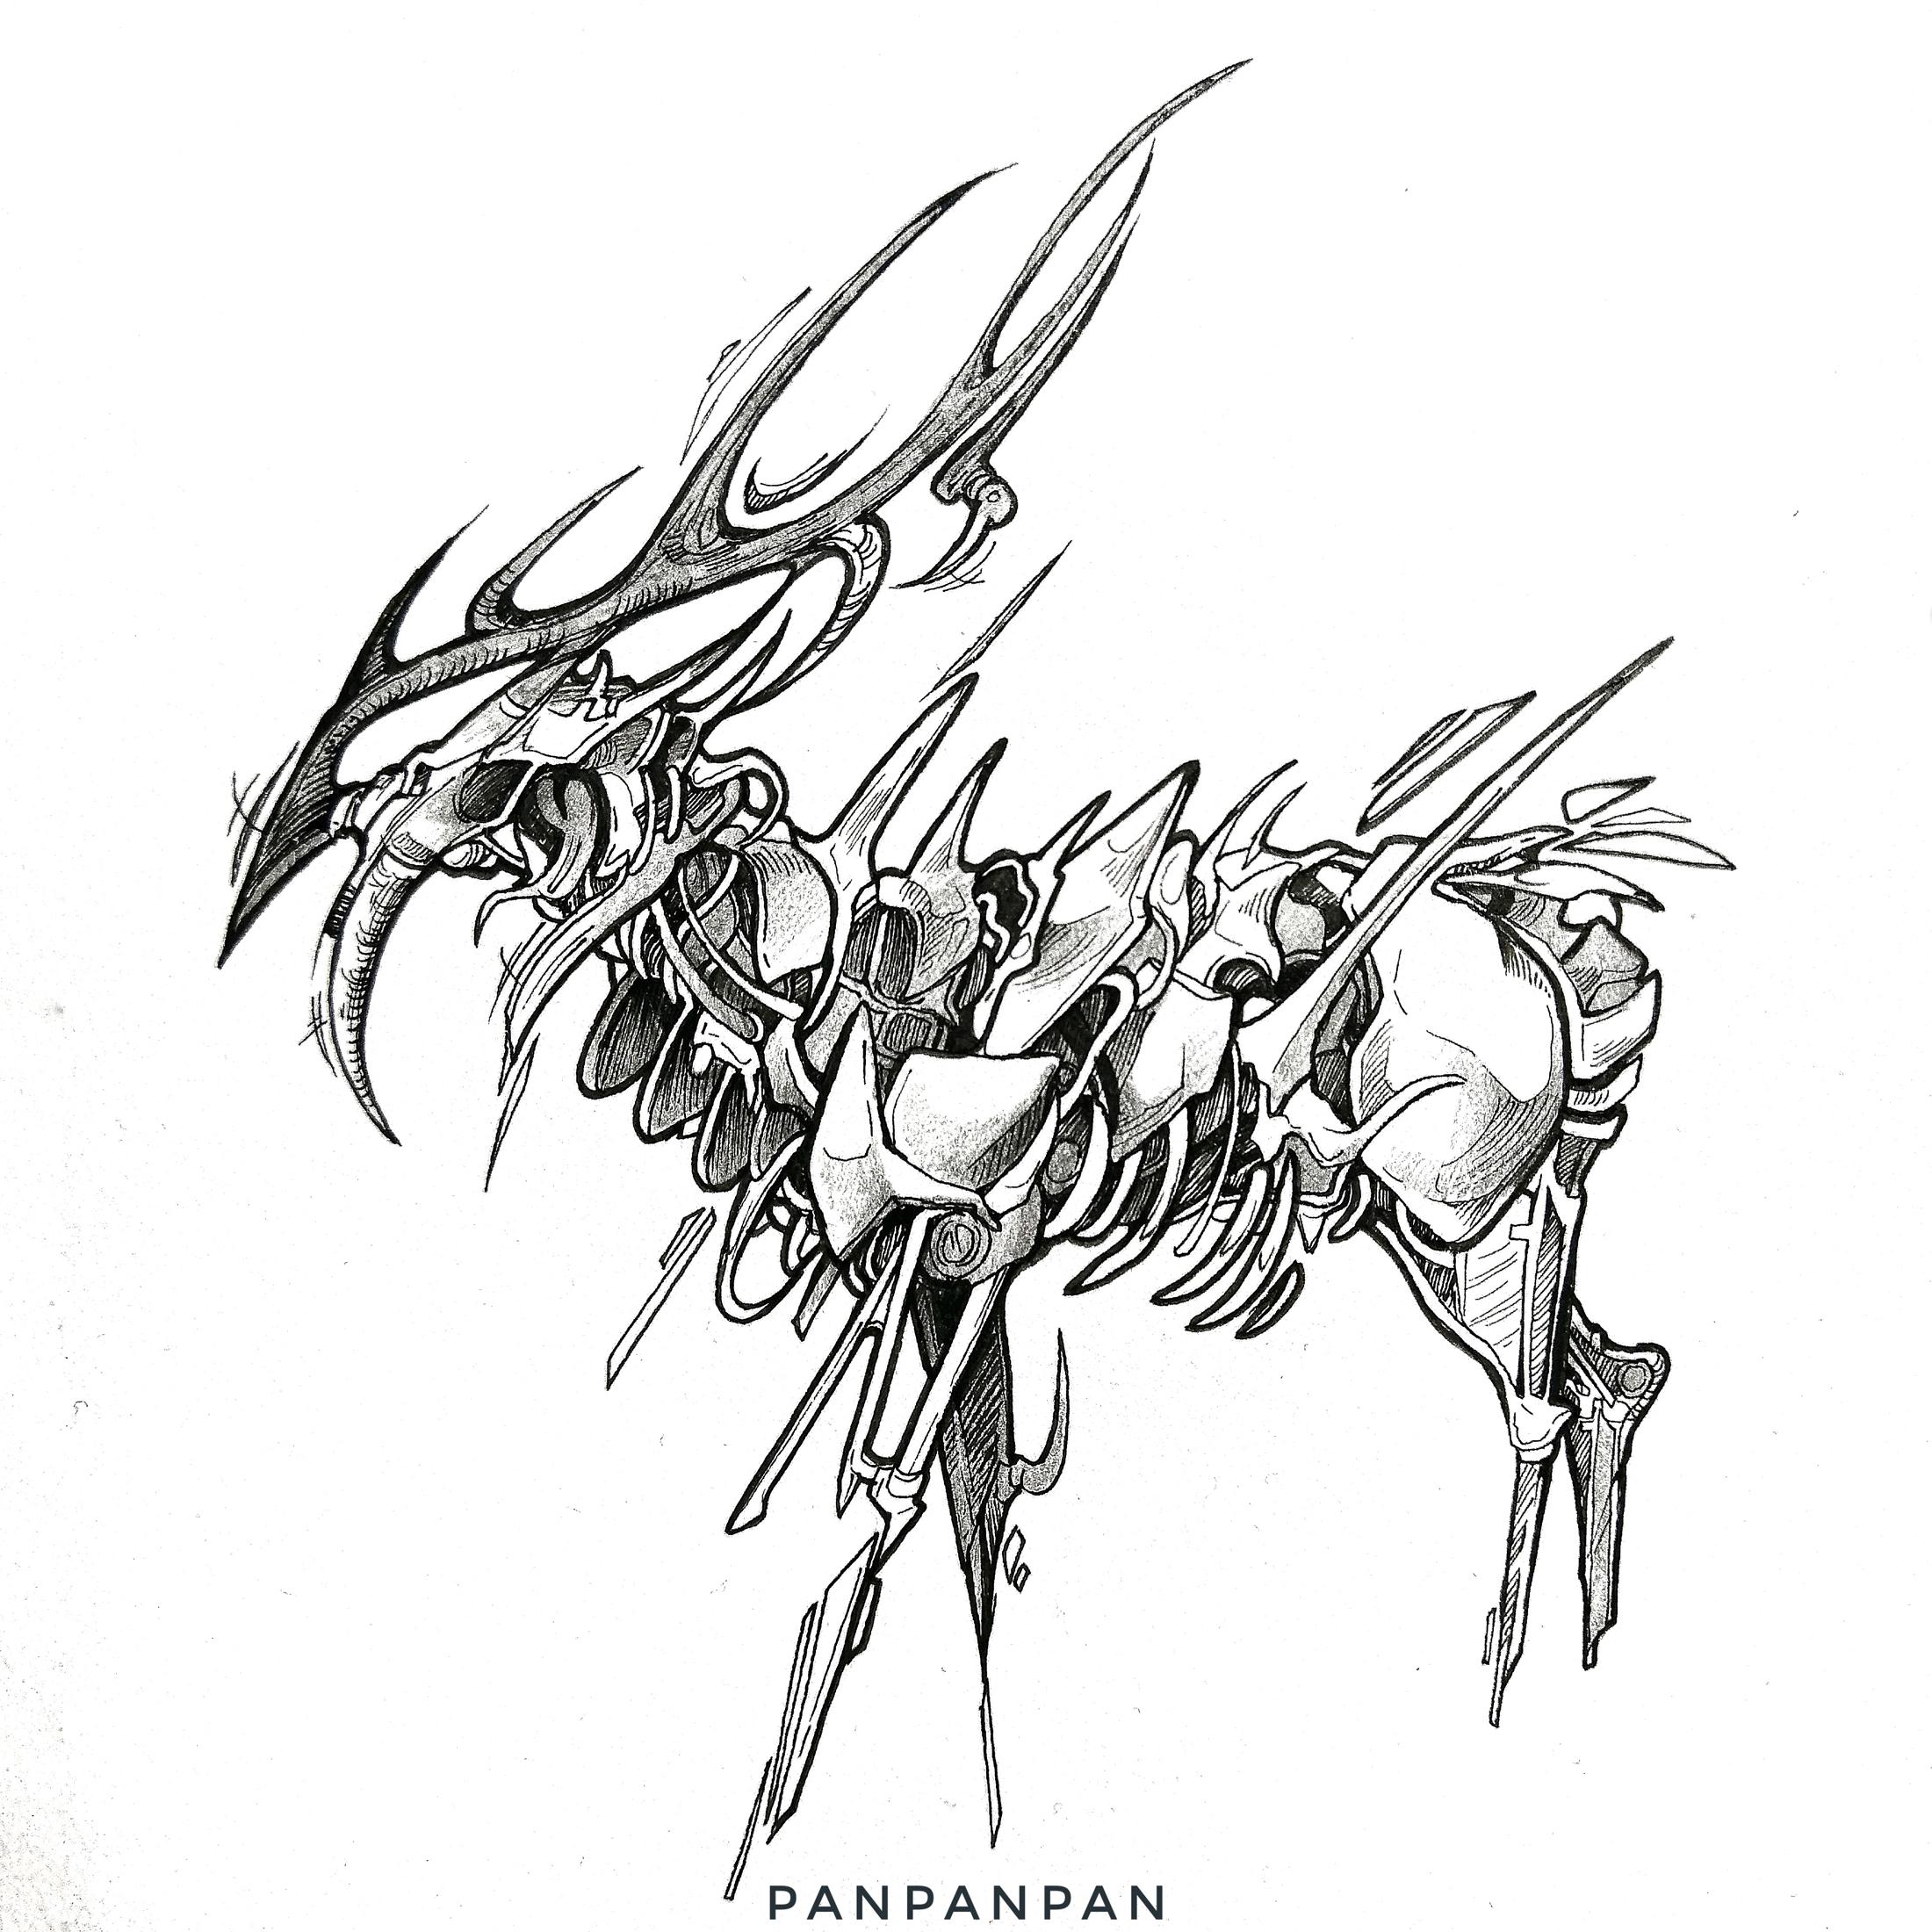 Skelet-Hirsch bei Panpanpan